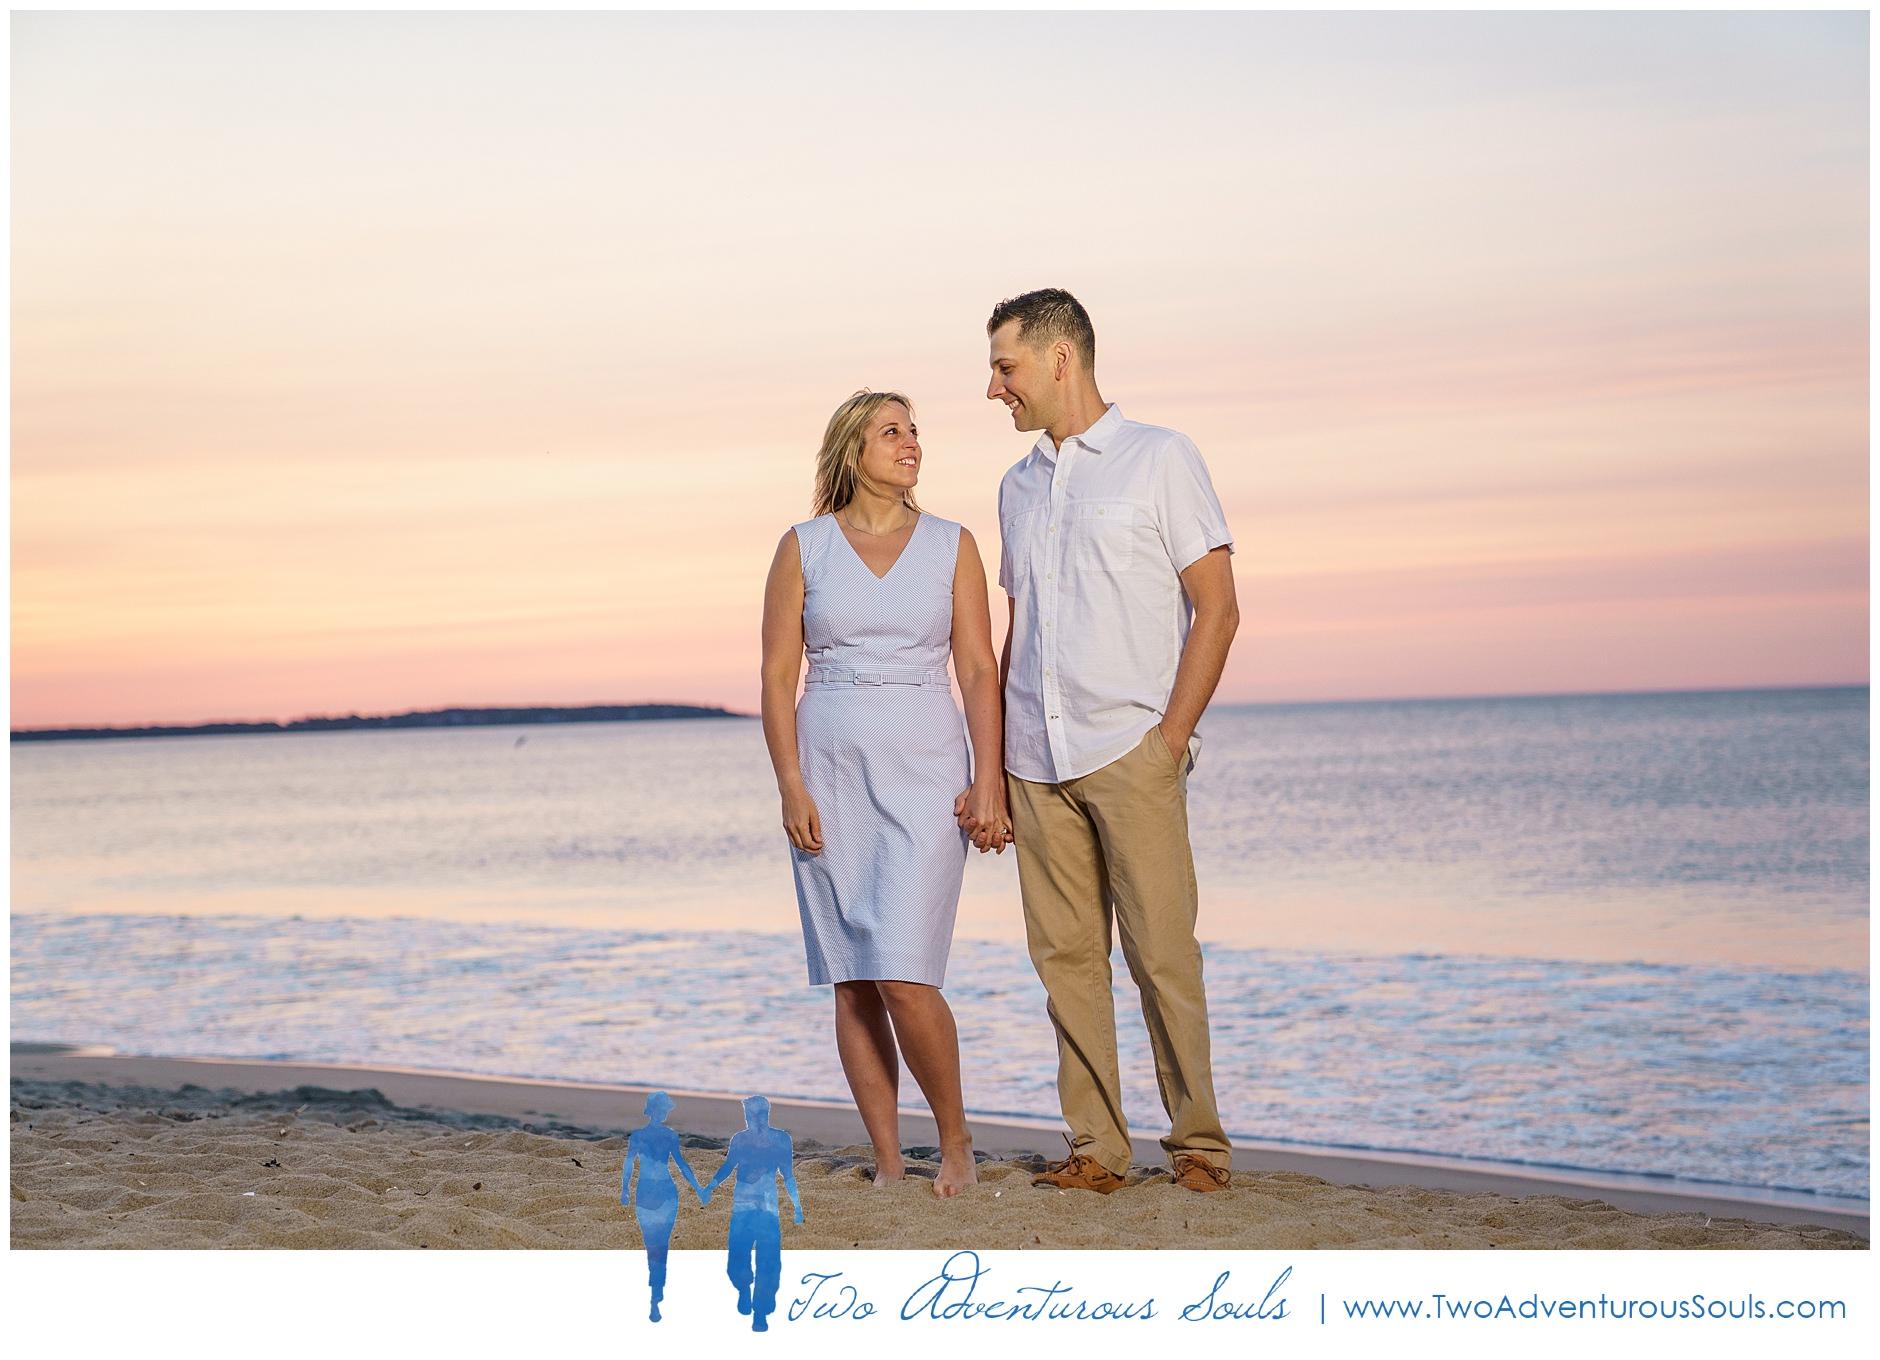 Maine Wedding Photographers, Connecticut Wedding Photographers, Old Orchard Beach Wedding Photographers, Two Adventurous Souls-JustinElise_0006.jpg